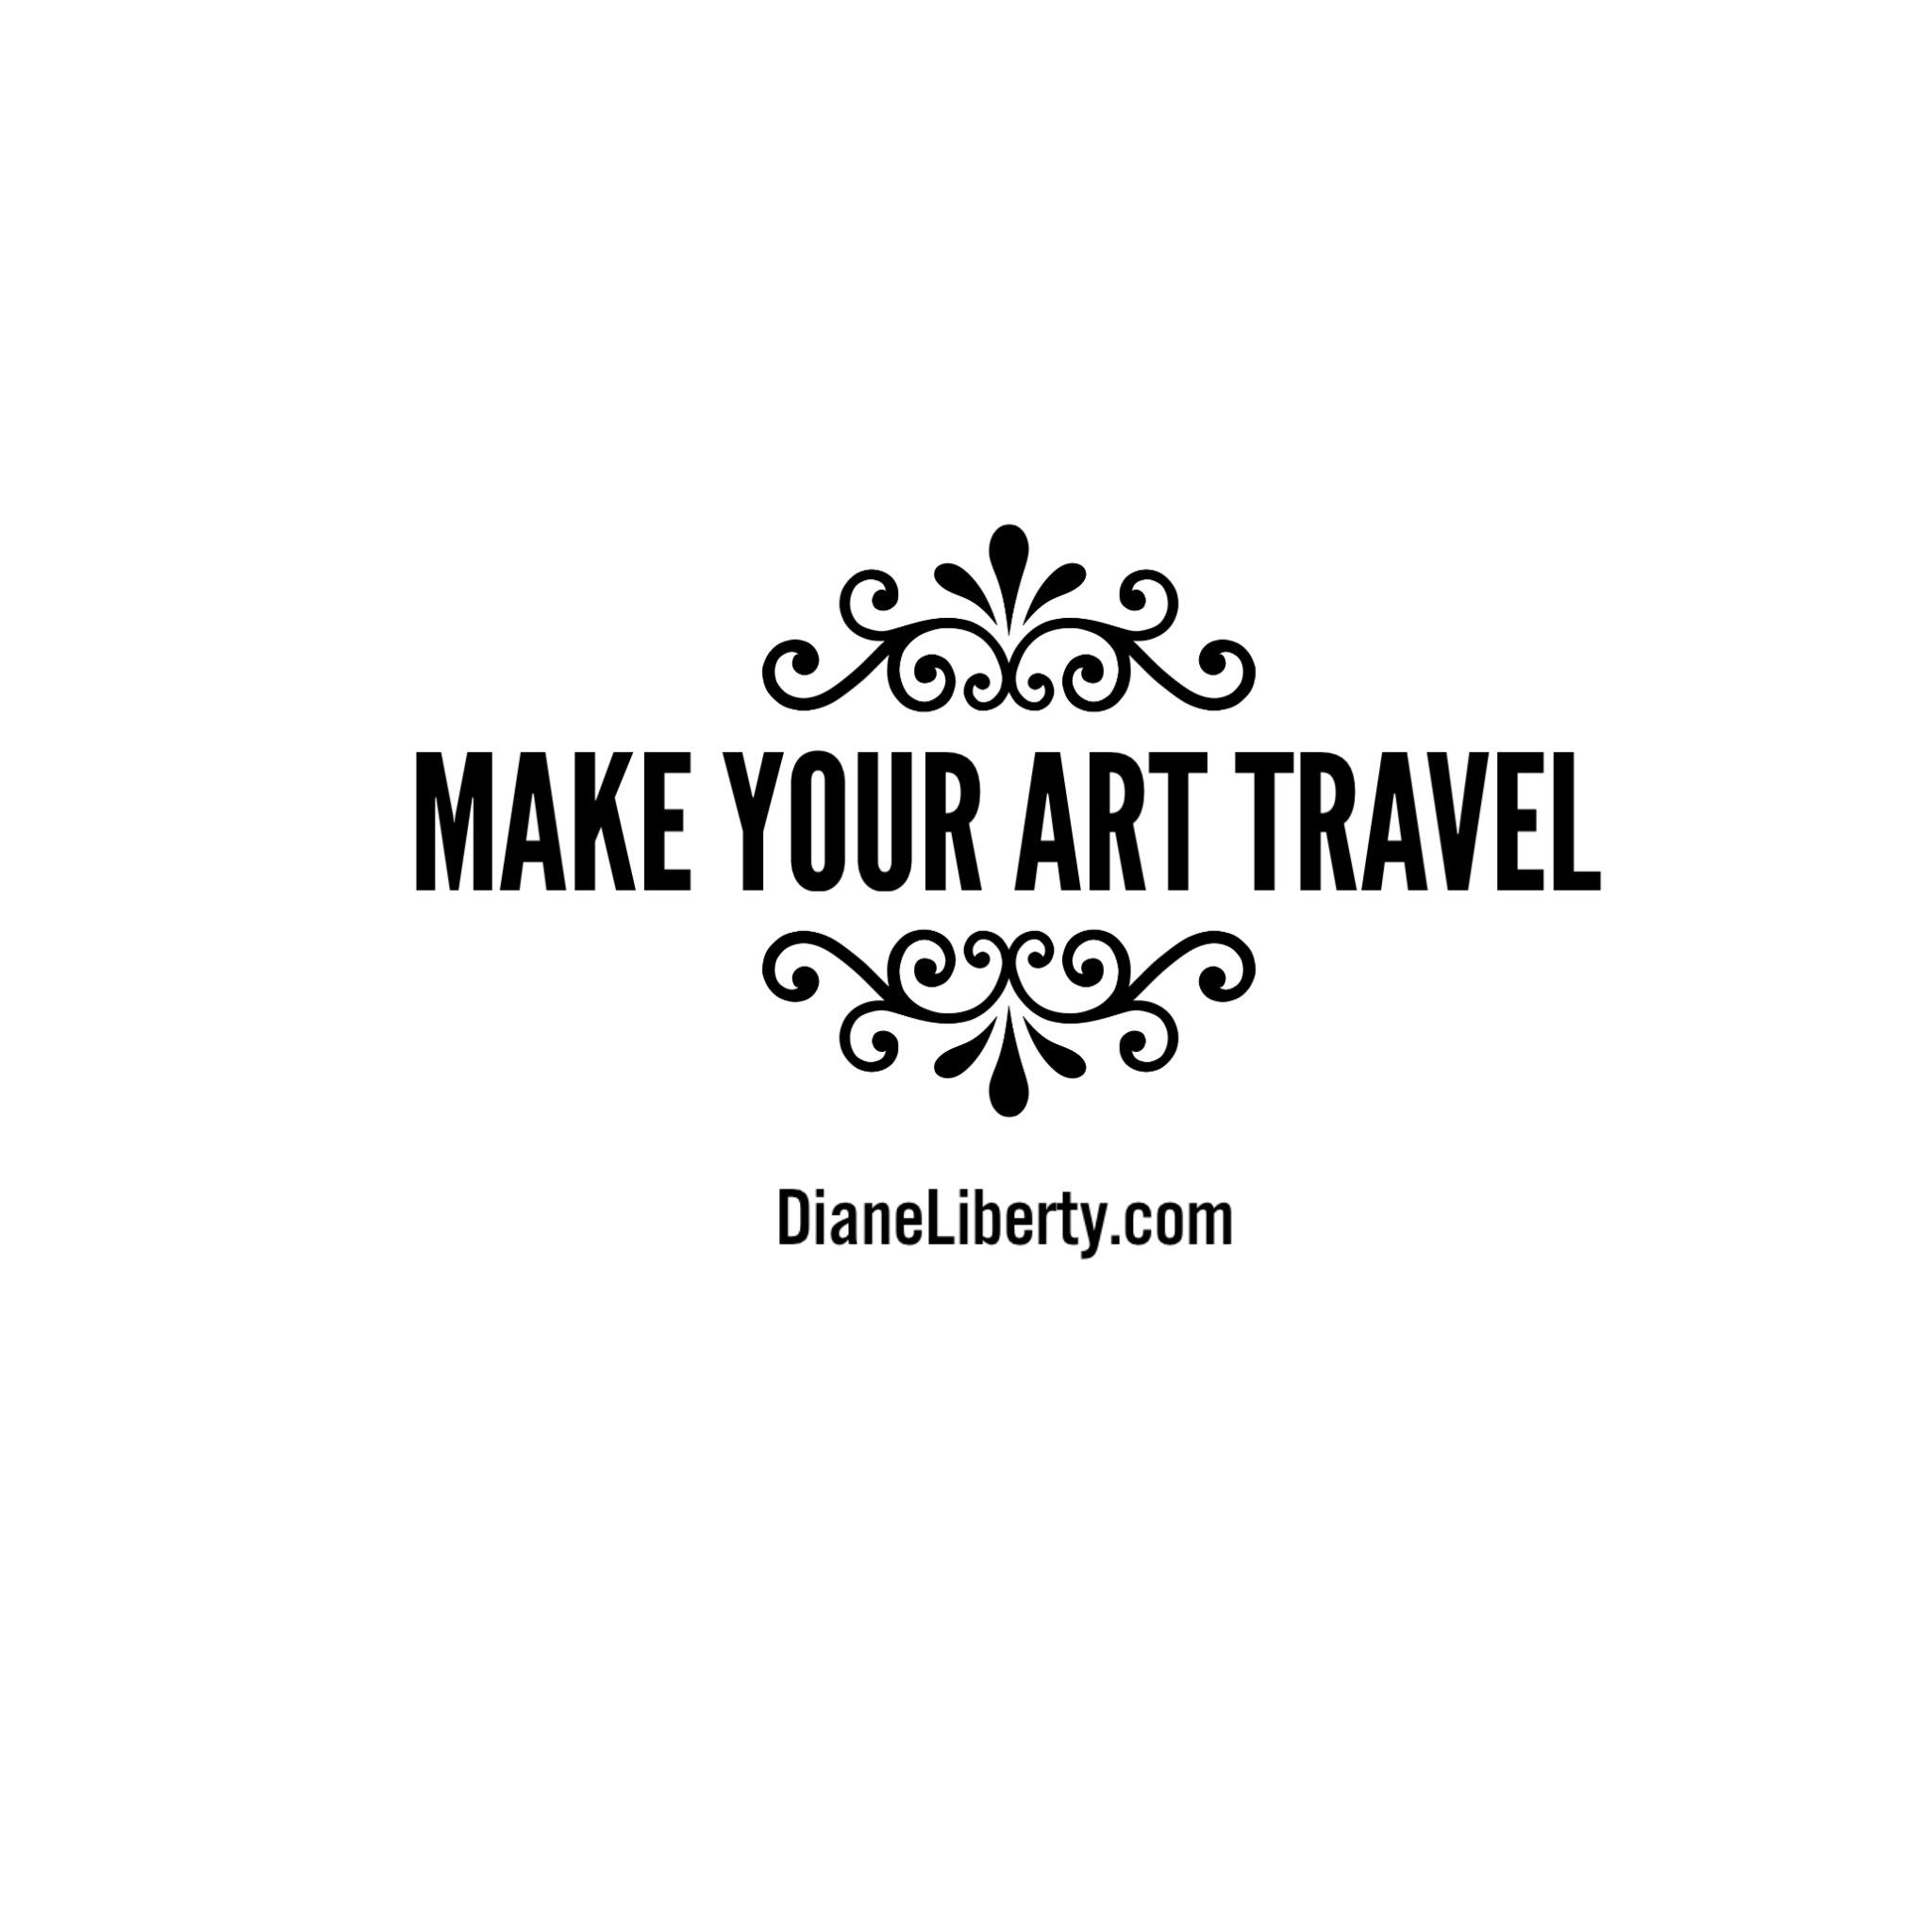 Make Your Art Travel